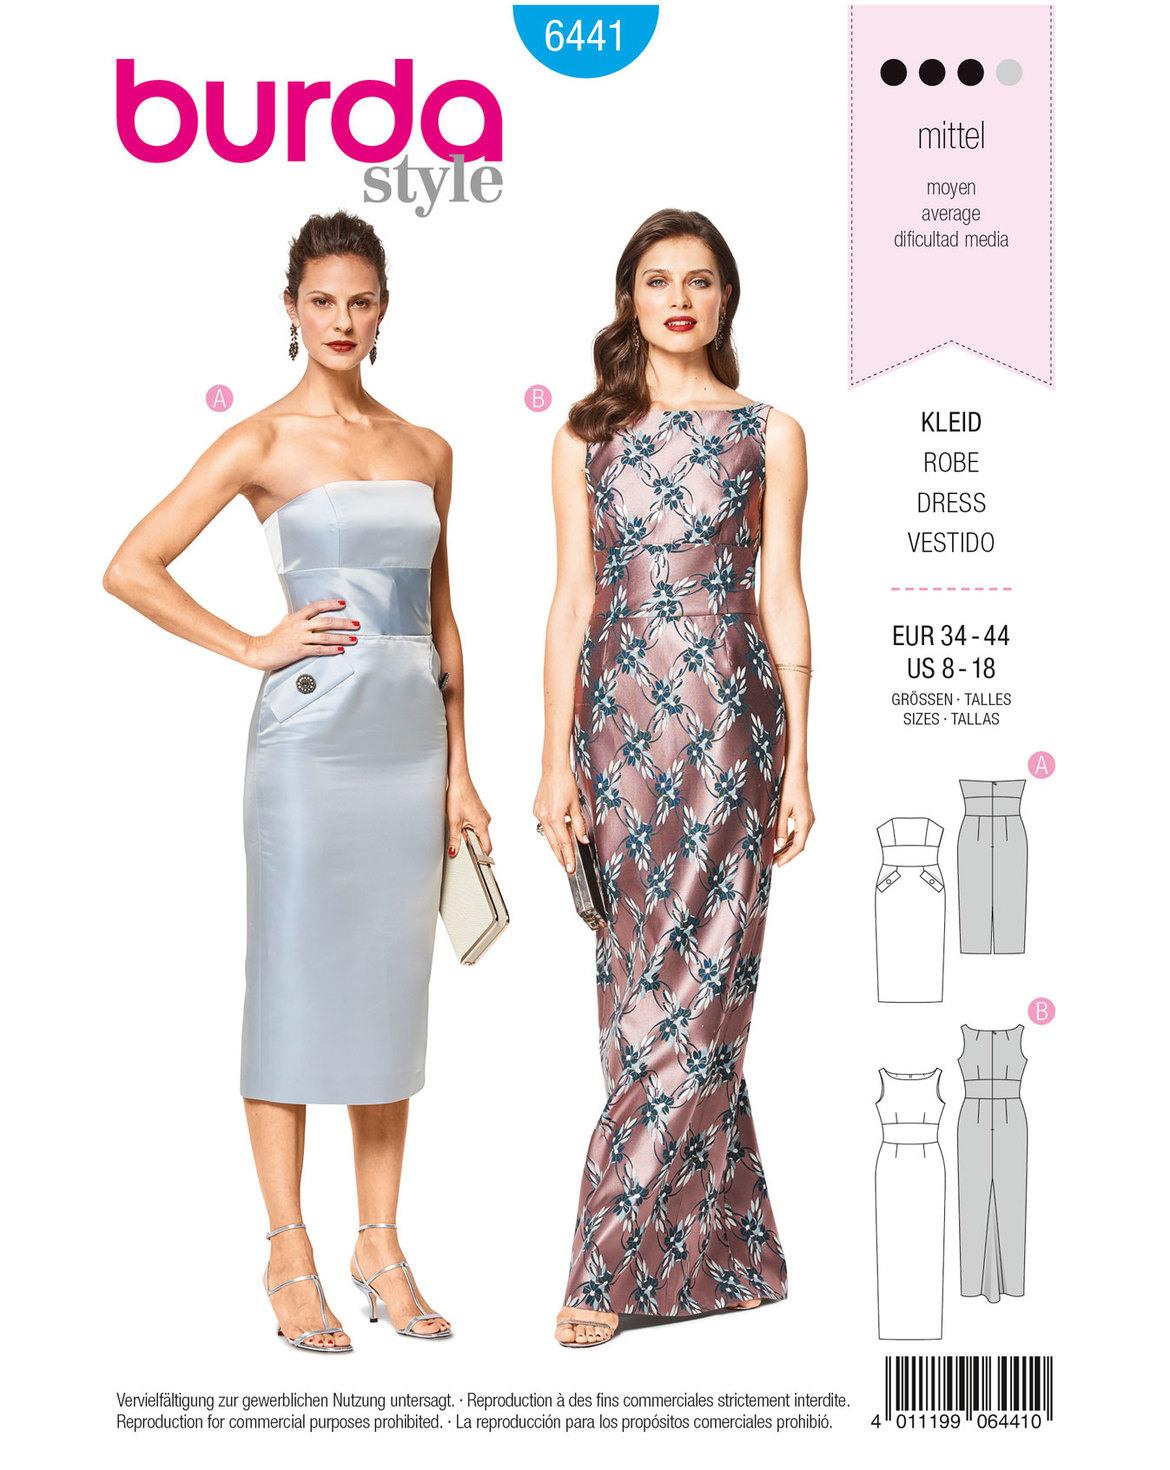 Designer Schön Abendkleid Nähen ÄrmelFormal Schön Abendkleid Nähen für 2019